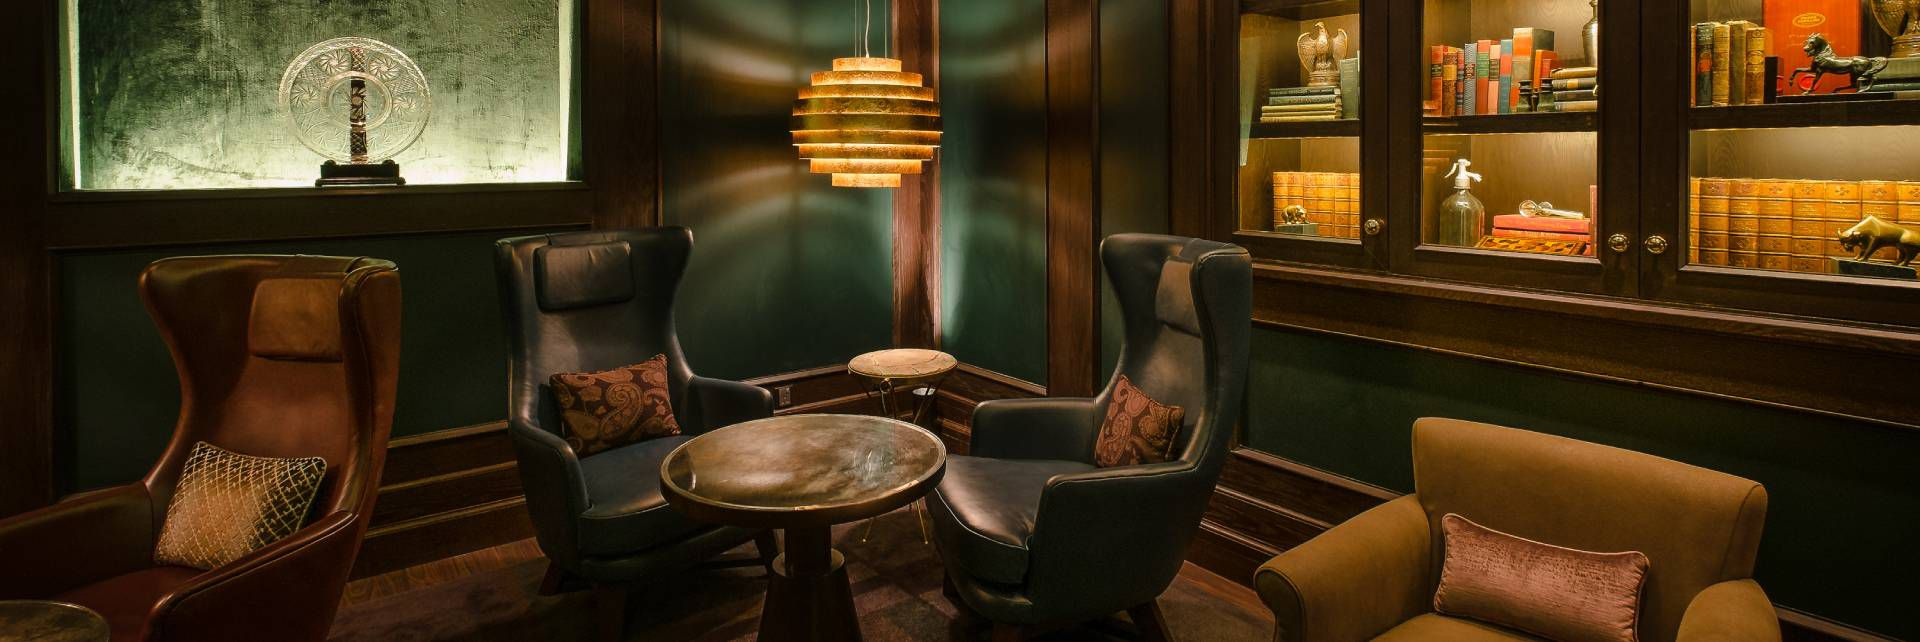 Regent Private dining